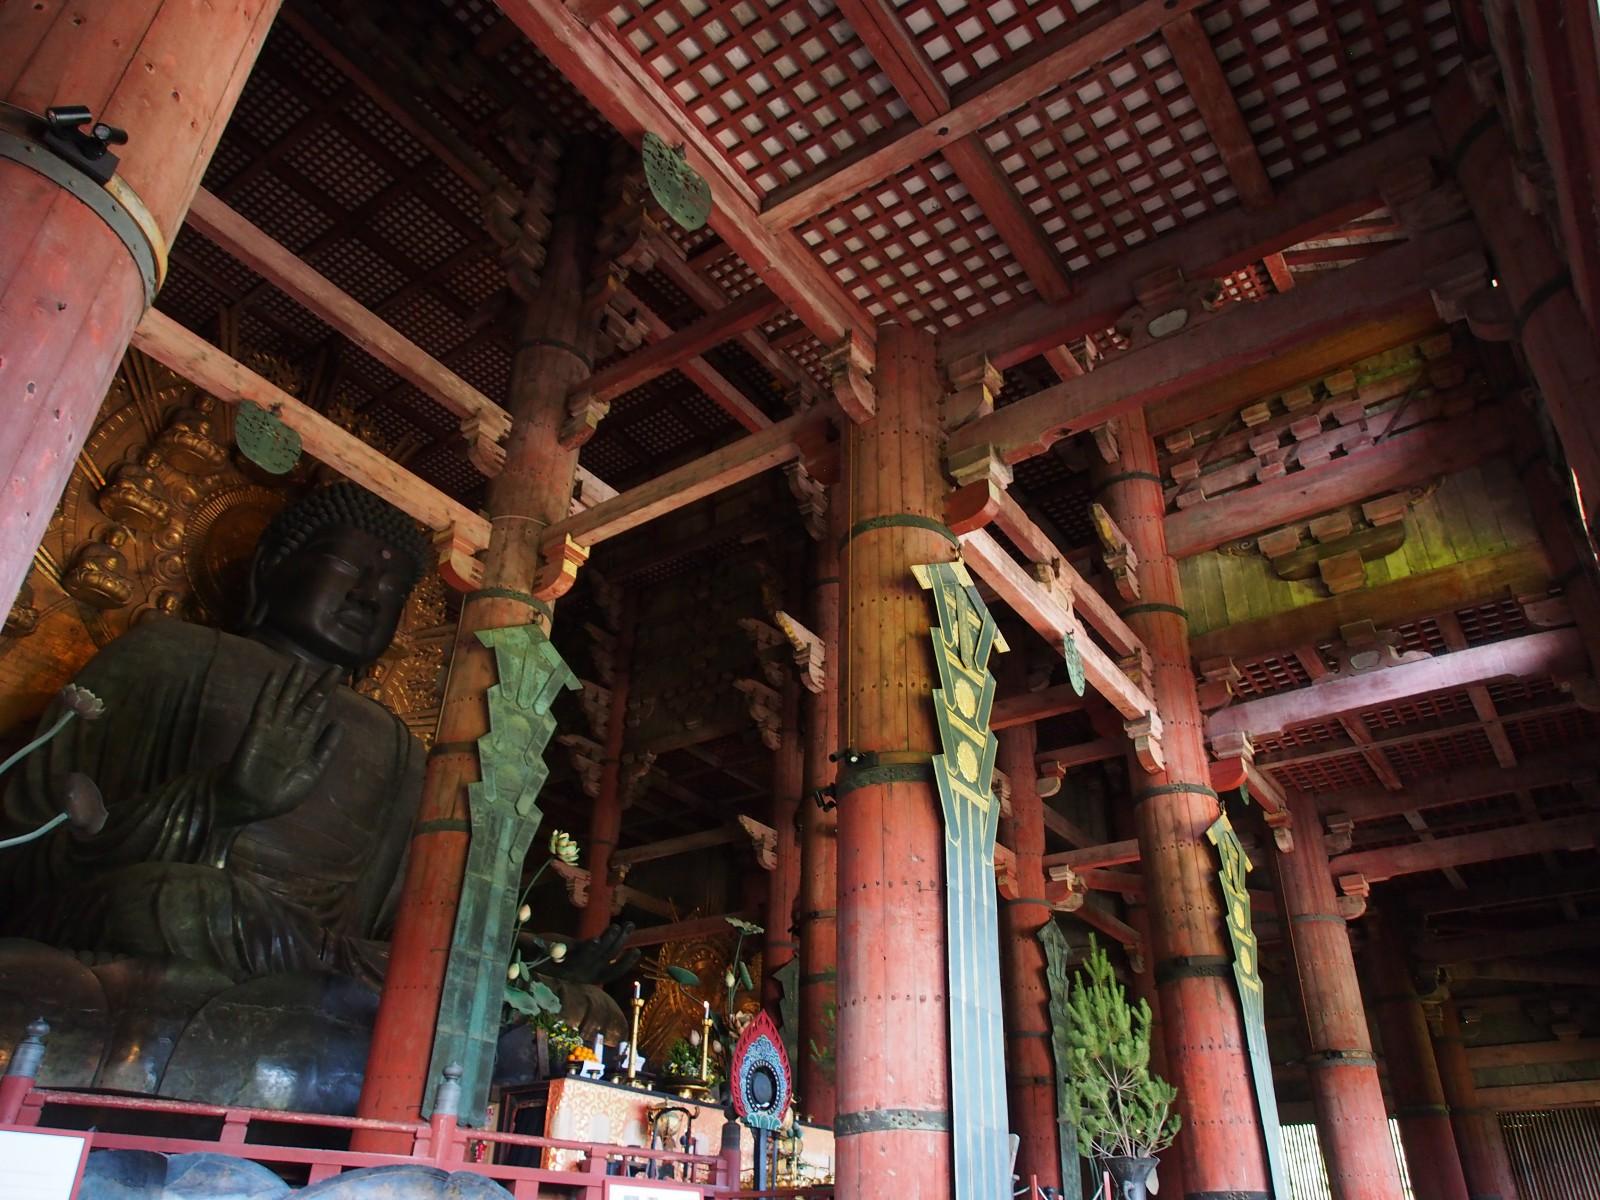 大仏殿の内部構造